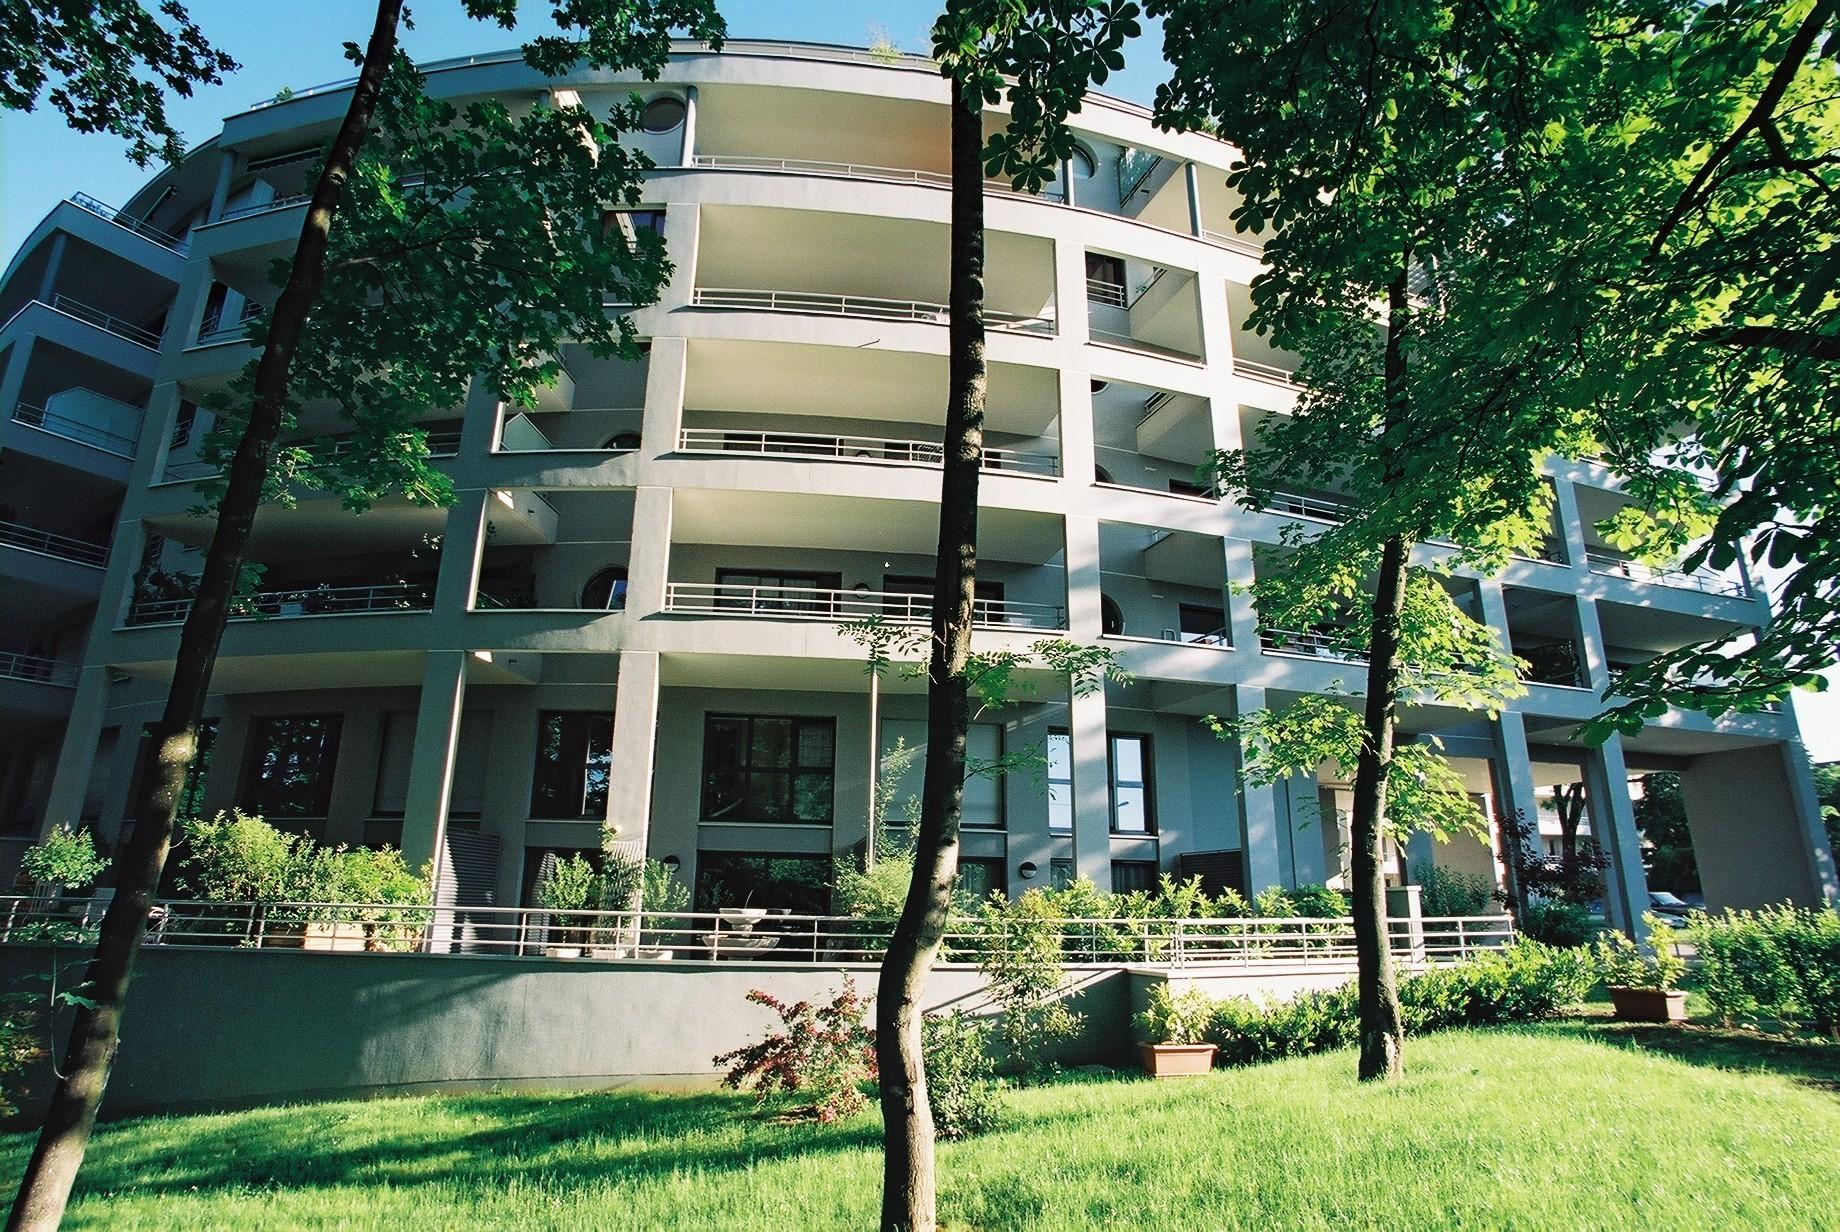 Présentation du groupe SMCI, immobilier neuf et rénové à Besançon, Lyon